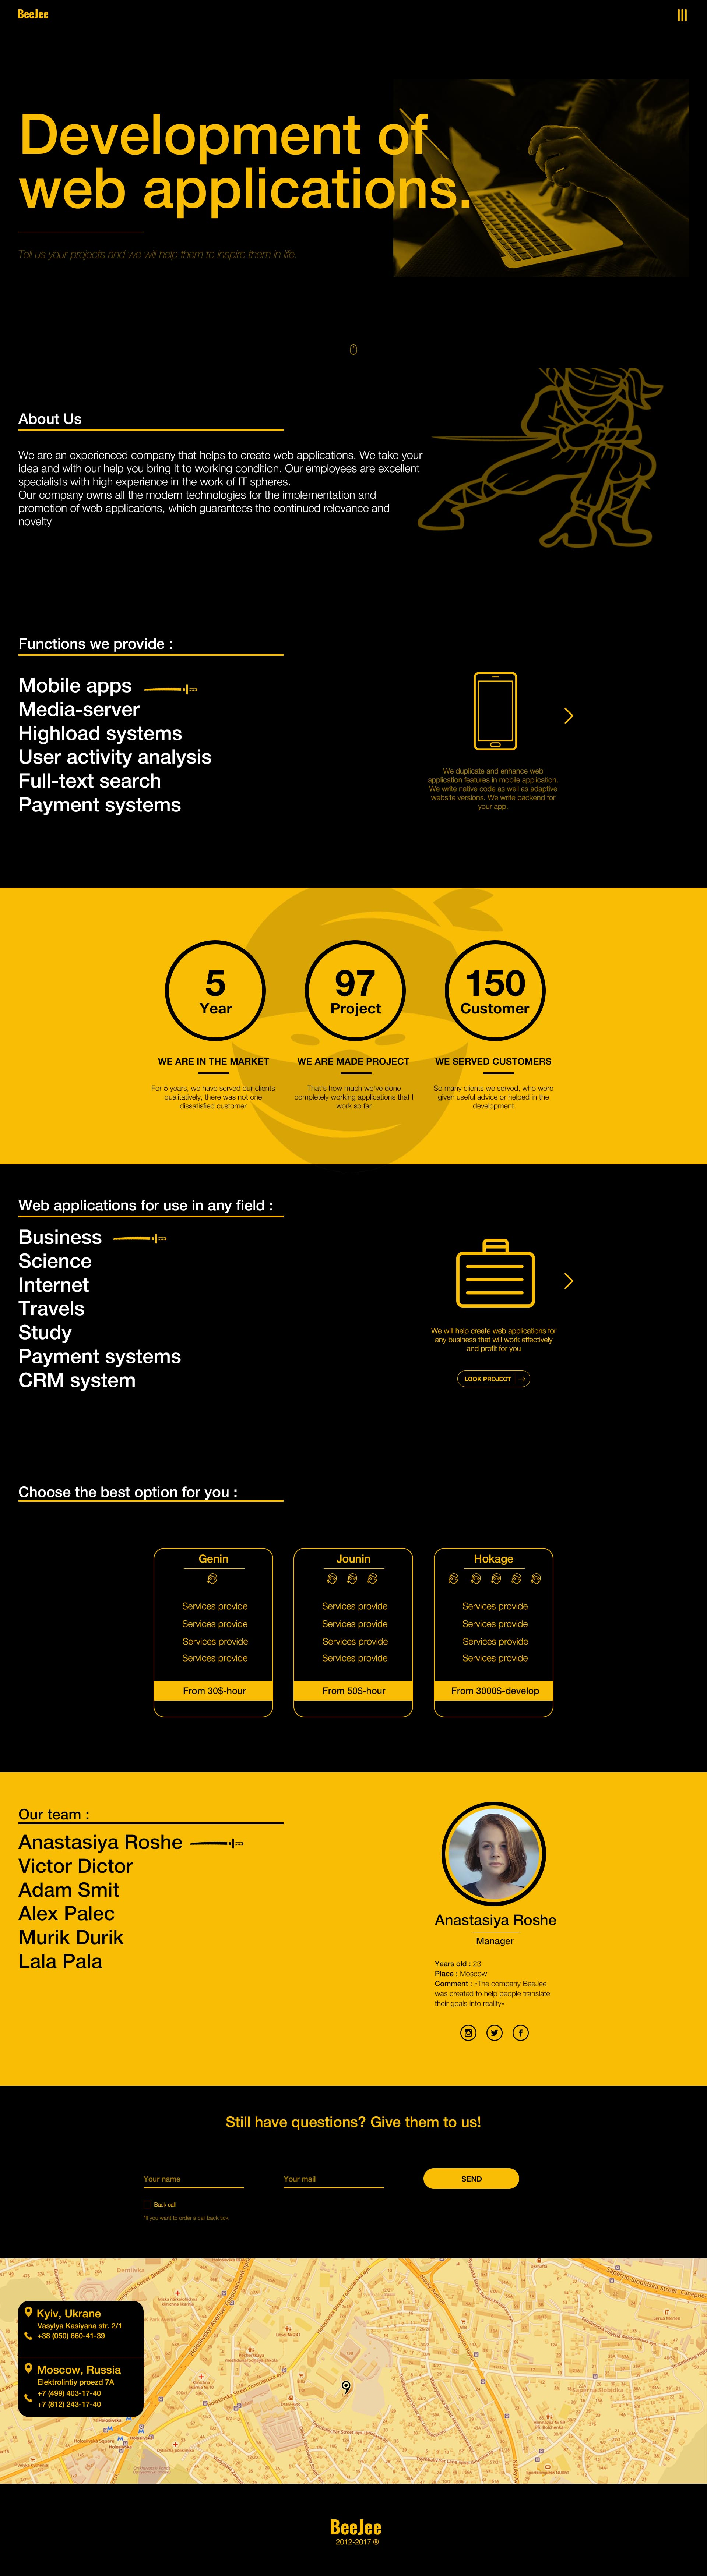 Концепт дизайна сайта в корпоративном стиле для IT компании фото f_15559677e4c35b5a.jpg